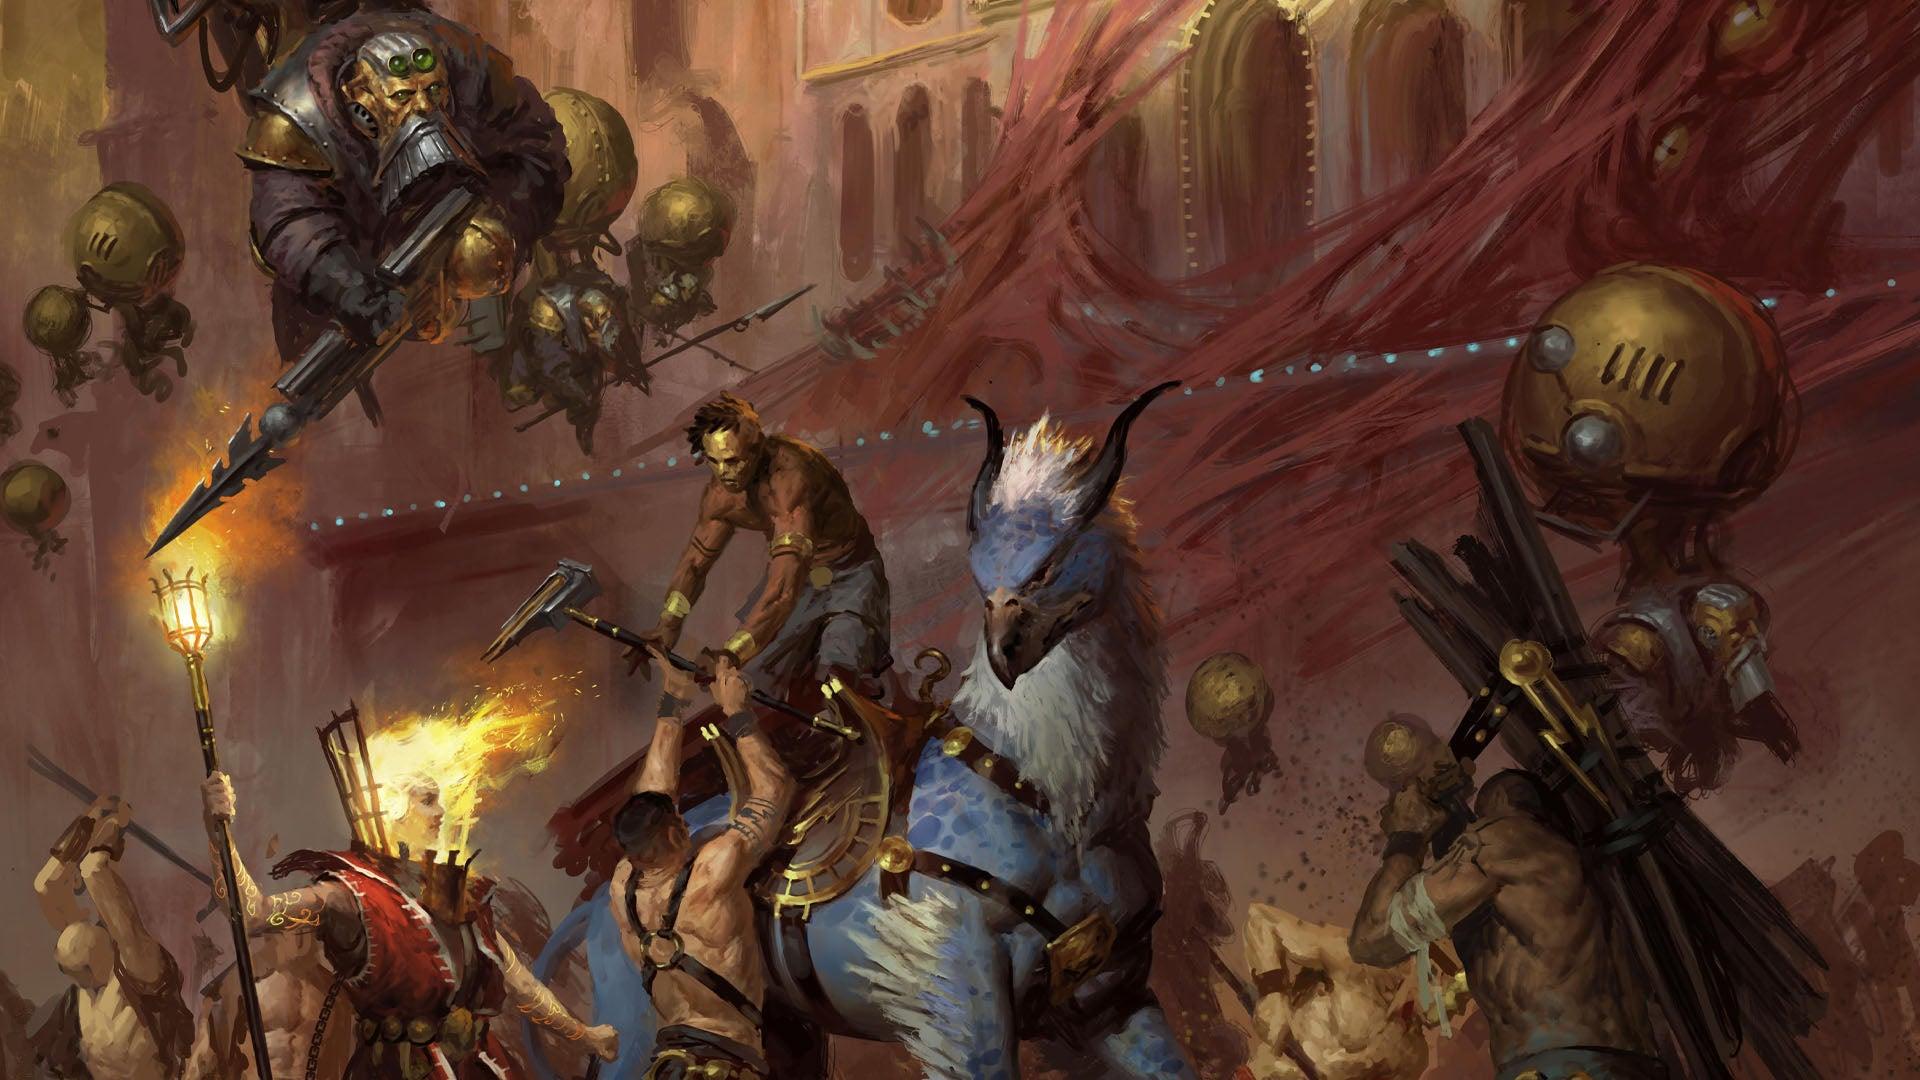 warhammer-age-of-sigmar-soulbound-rpg-starter-set-art.jpg